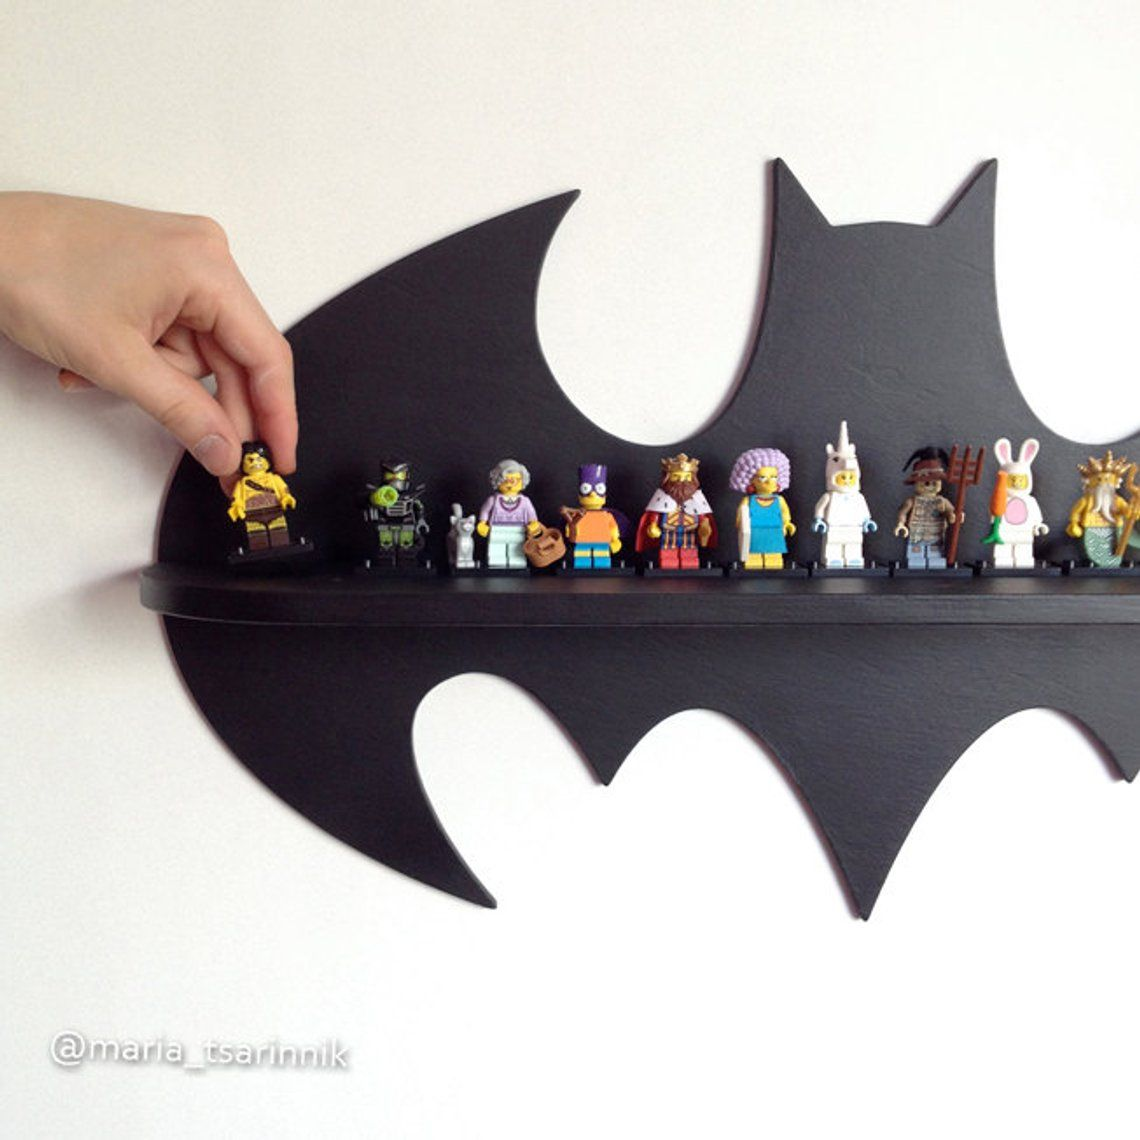 Holzregal Bat 24 In X 13 In In 2020 Batman Room Wooden Shelves Superhero Room